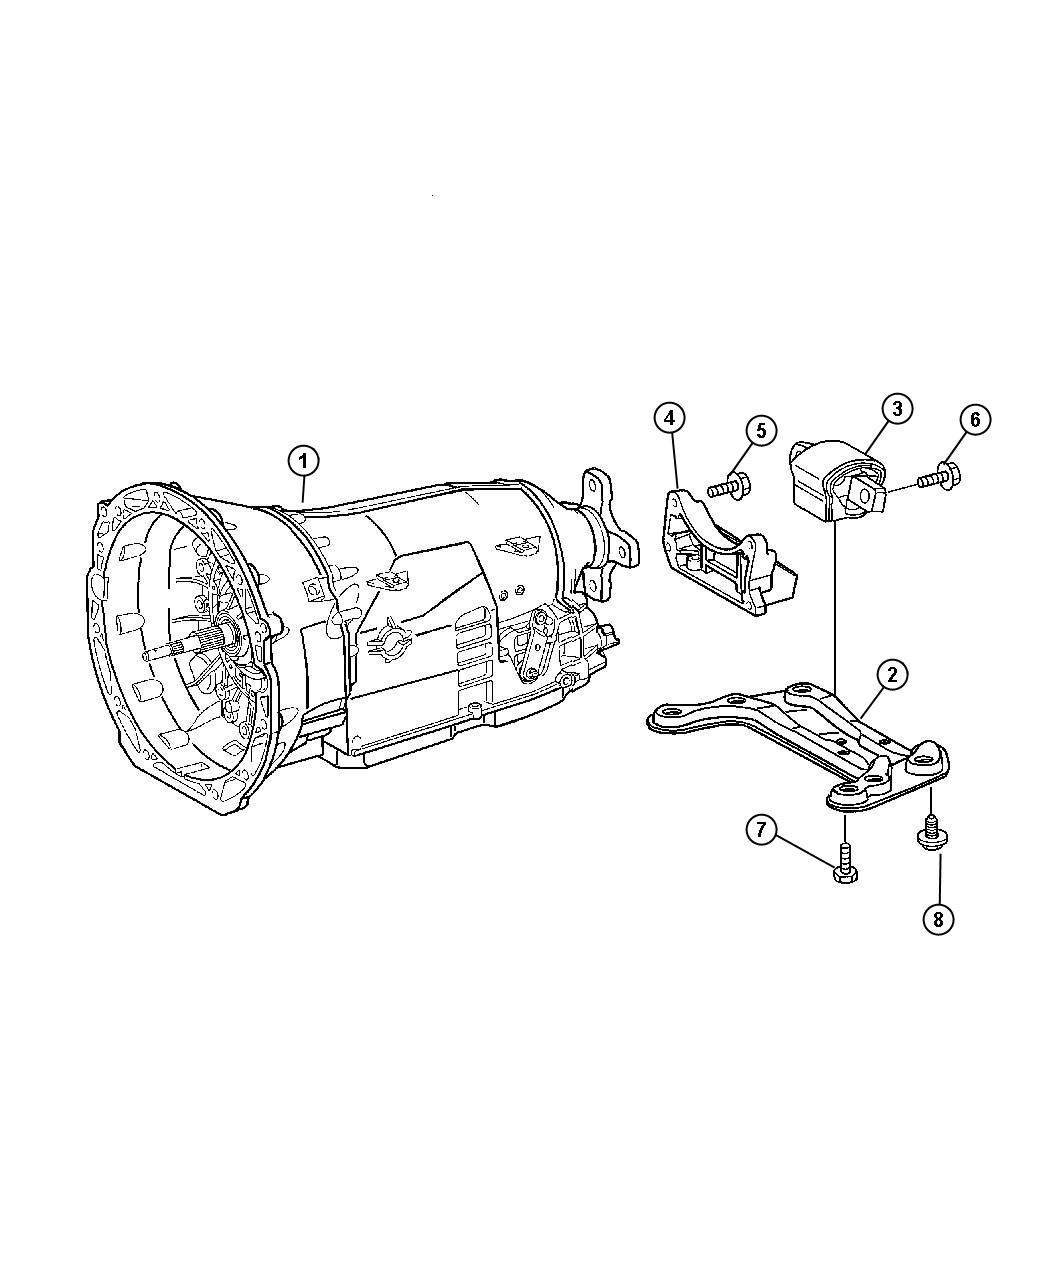 Chrysler Crossfire Support. Transmission. Rear, mount